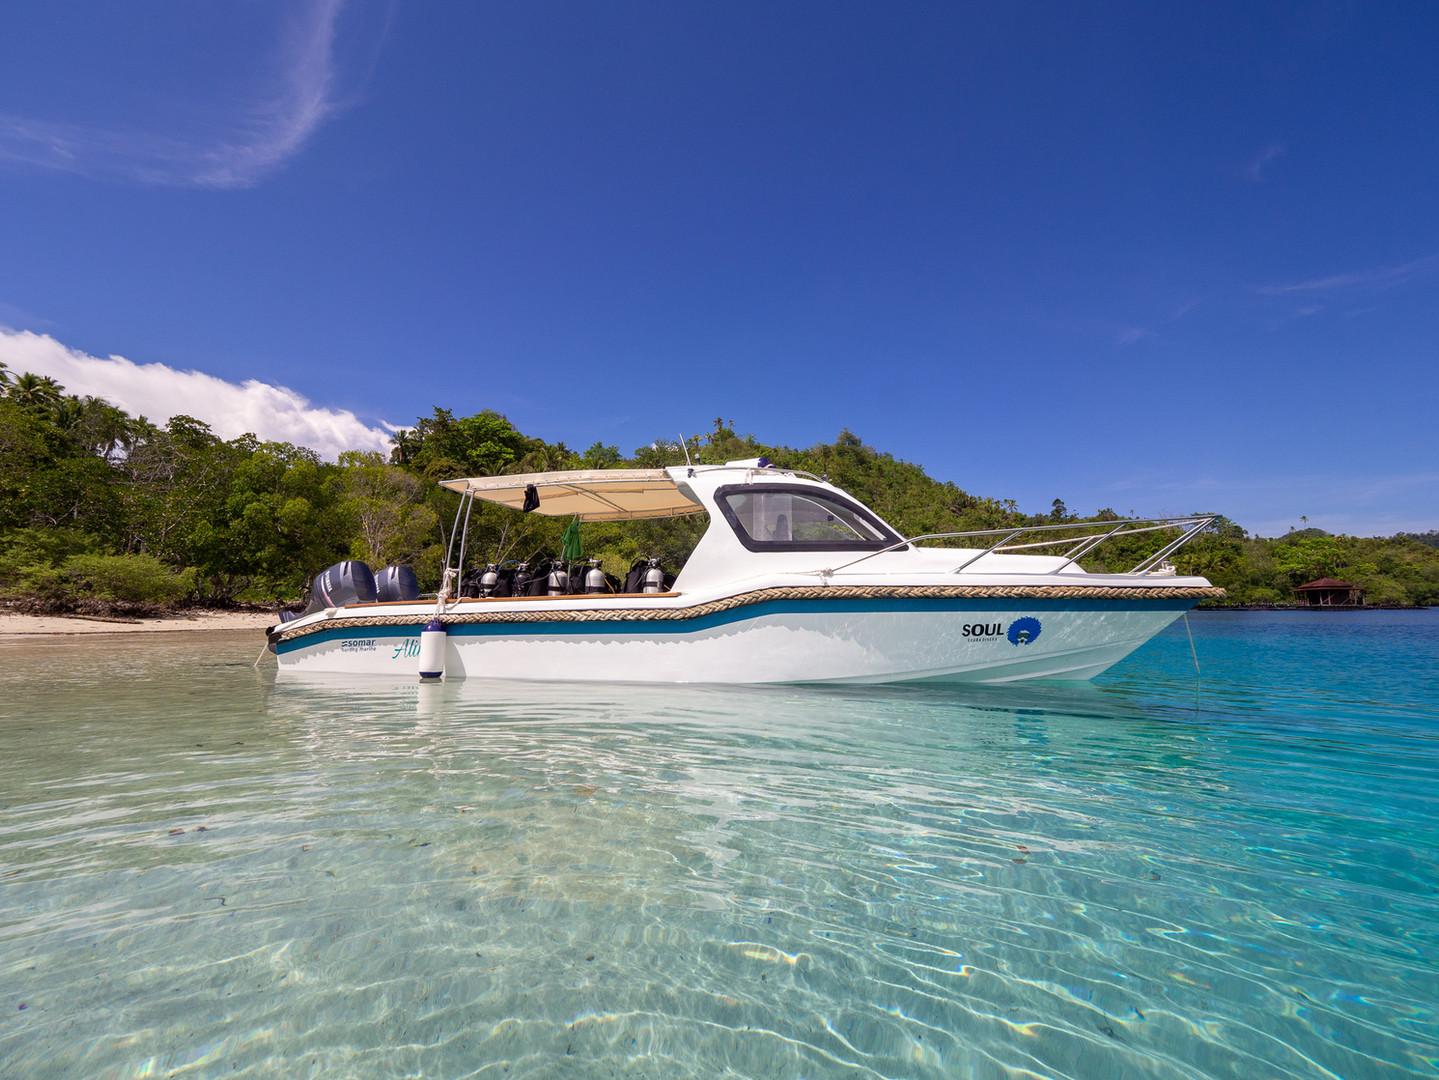 Our boat Aline, built September 2019.